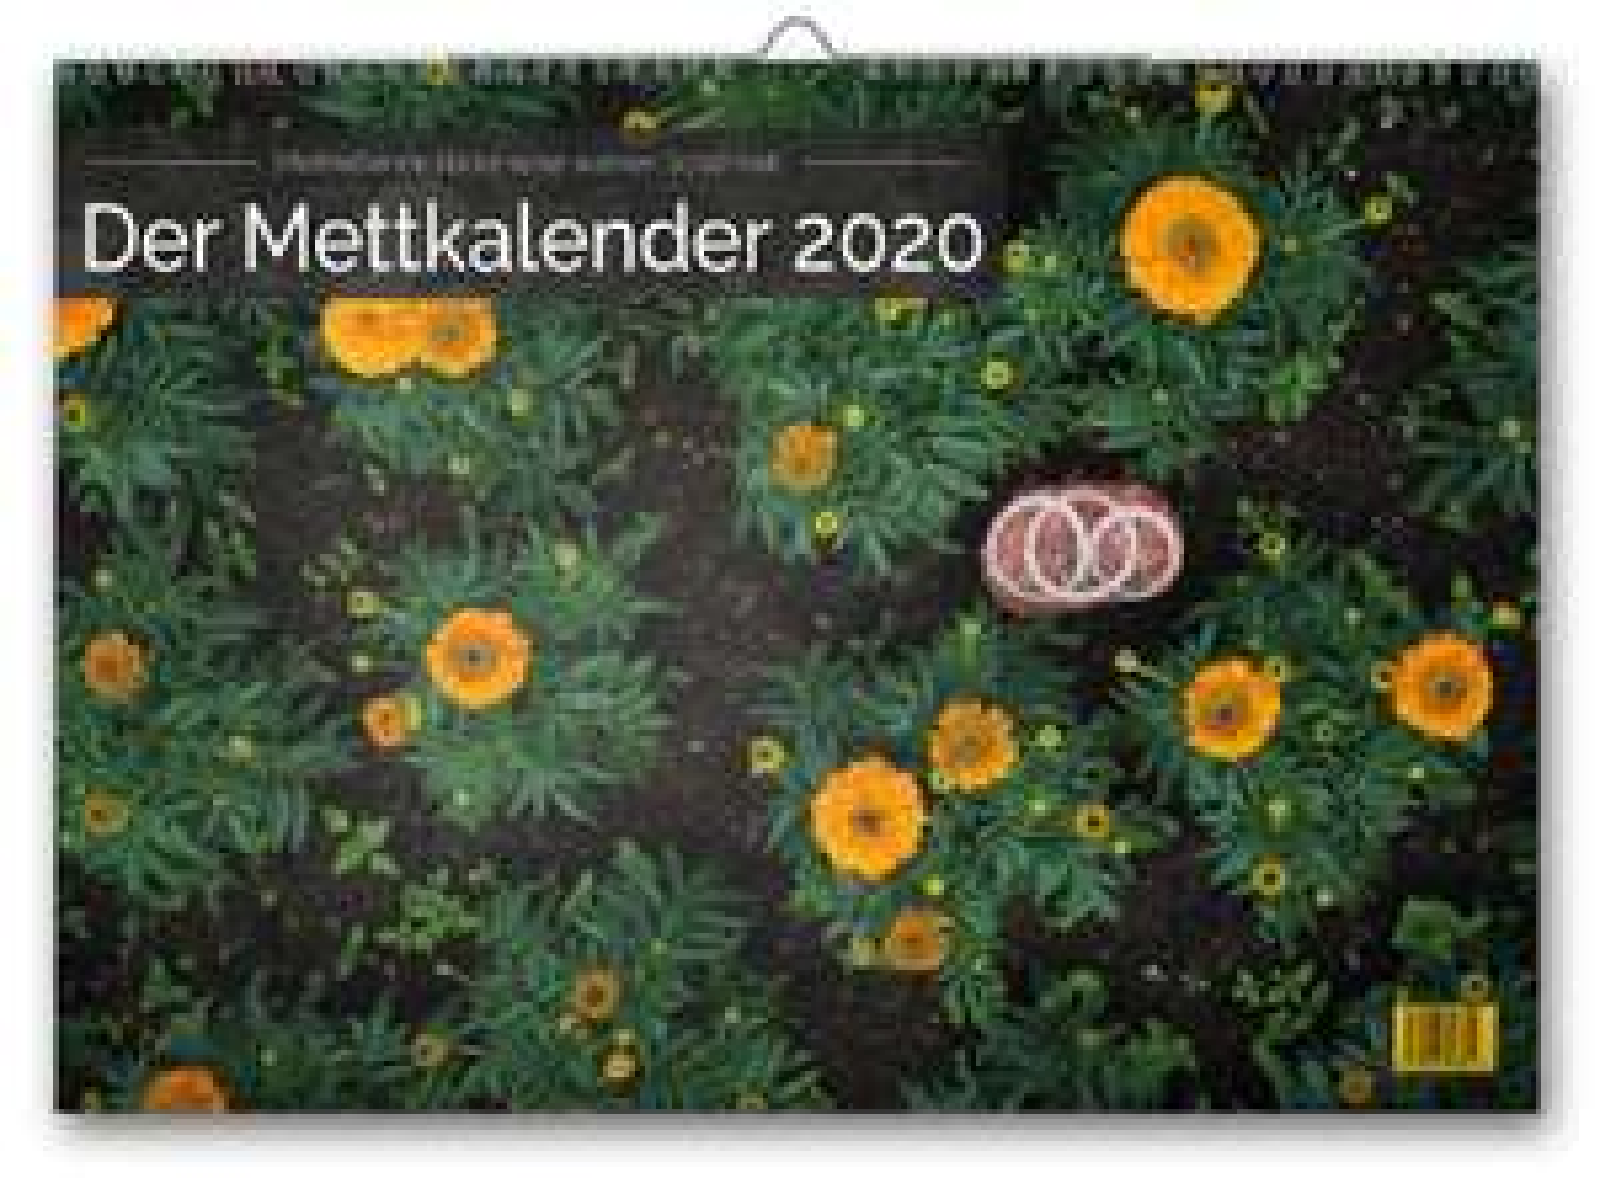 Lustiger Mettkalender - Jahreskalender 2020